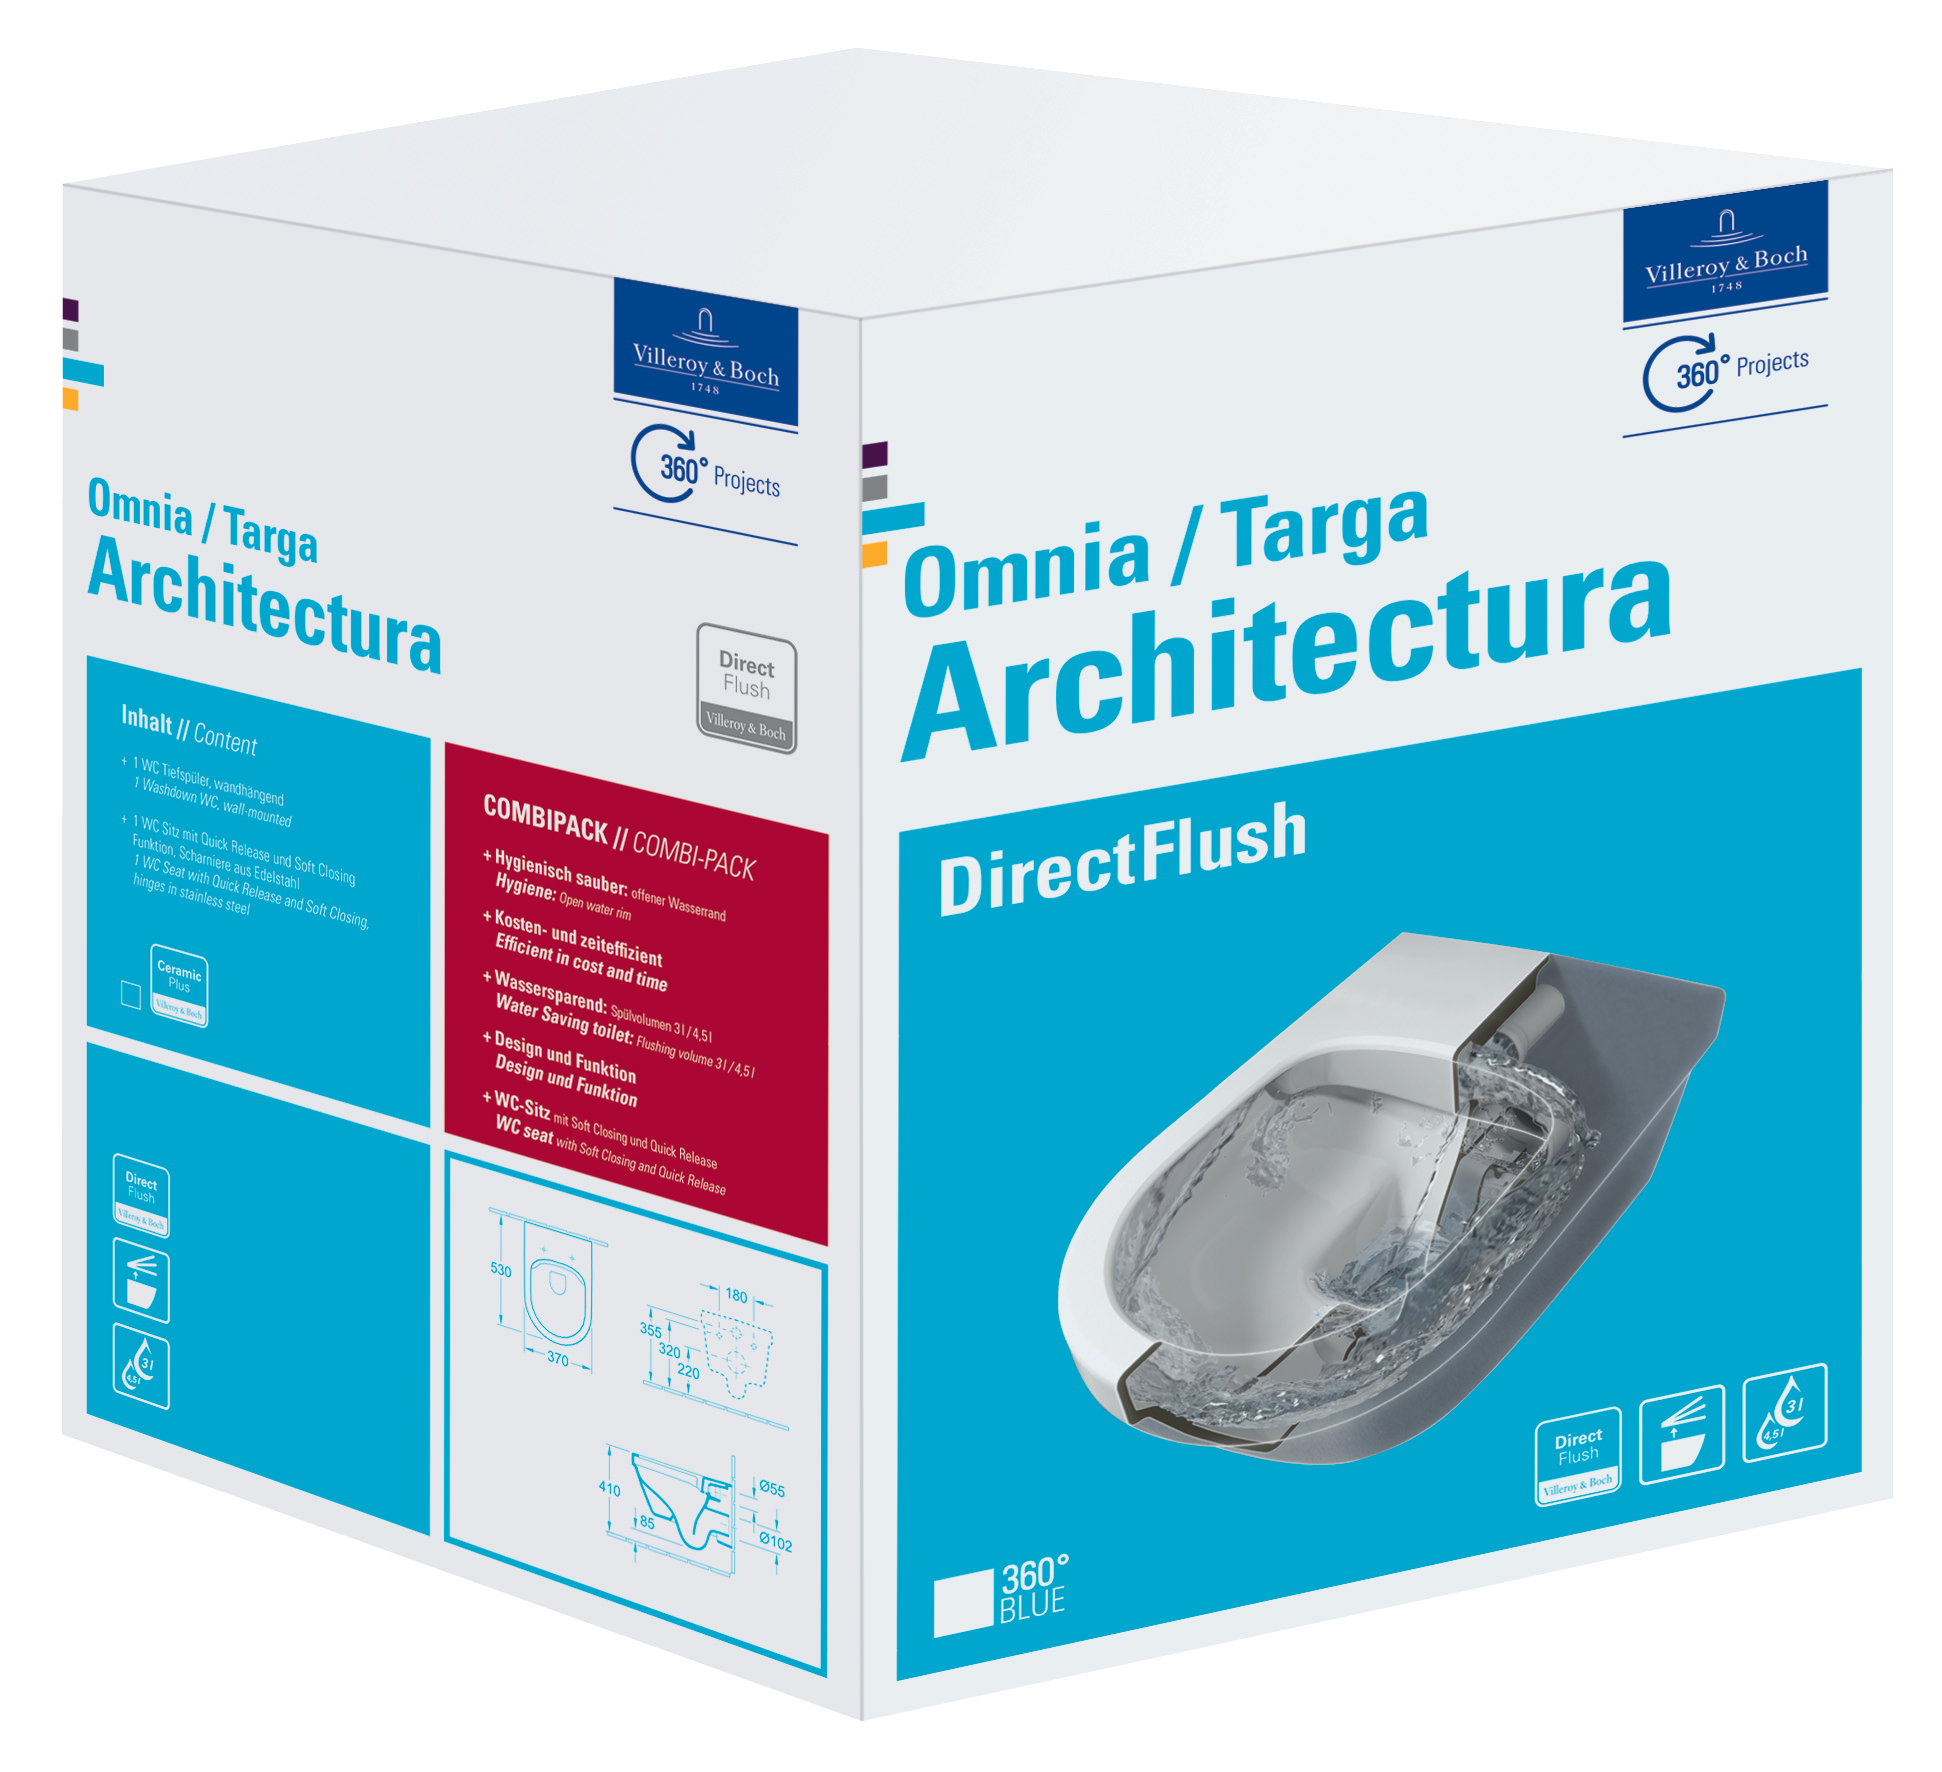 Gut Architectura WC Complete 5684HR - Villeroy & Boch SU21